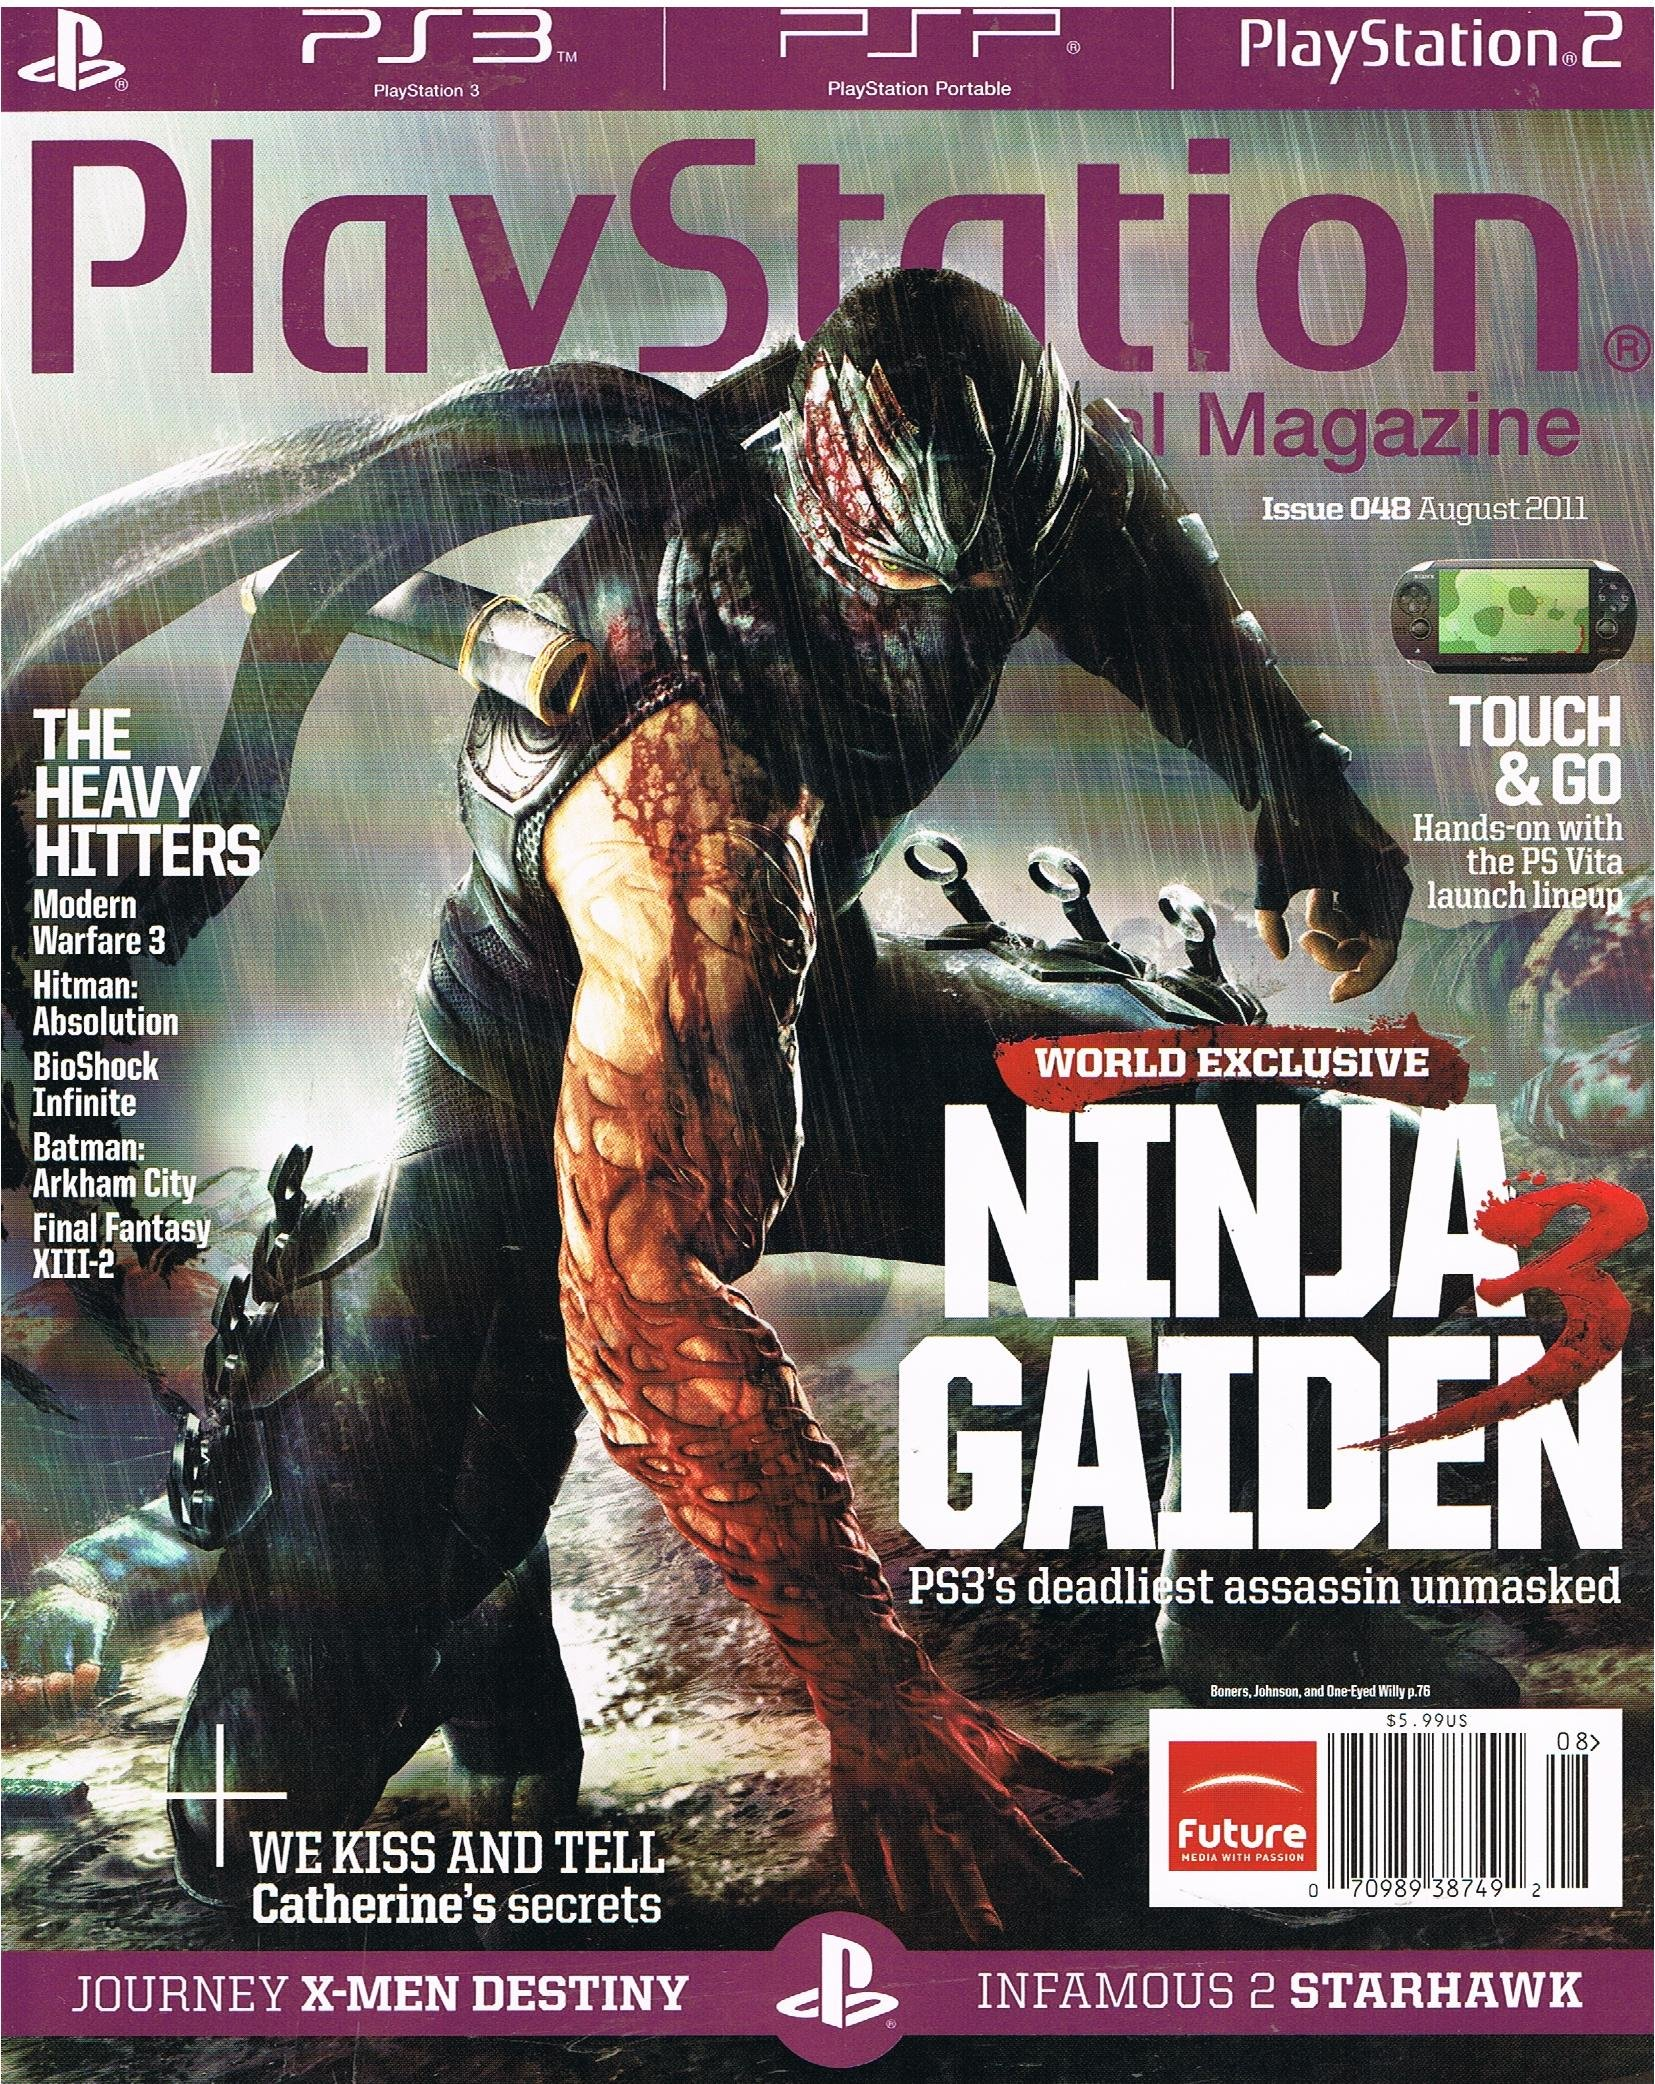 Playstation Magazine August 2011: Various: Amazon.com: Books